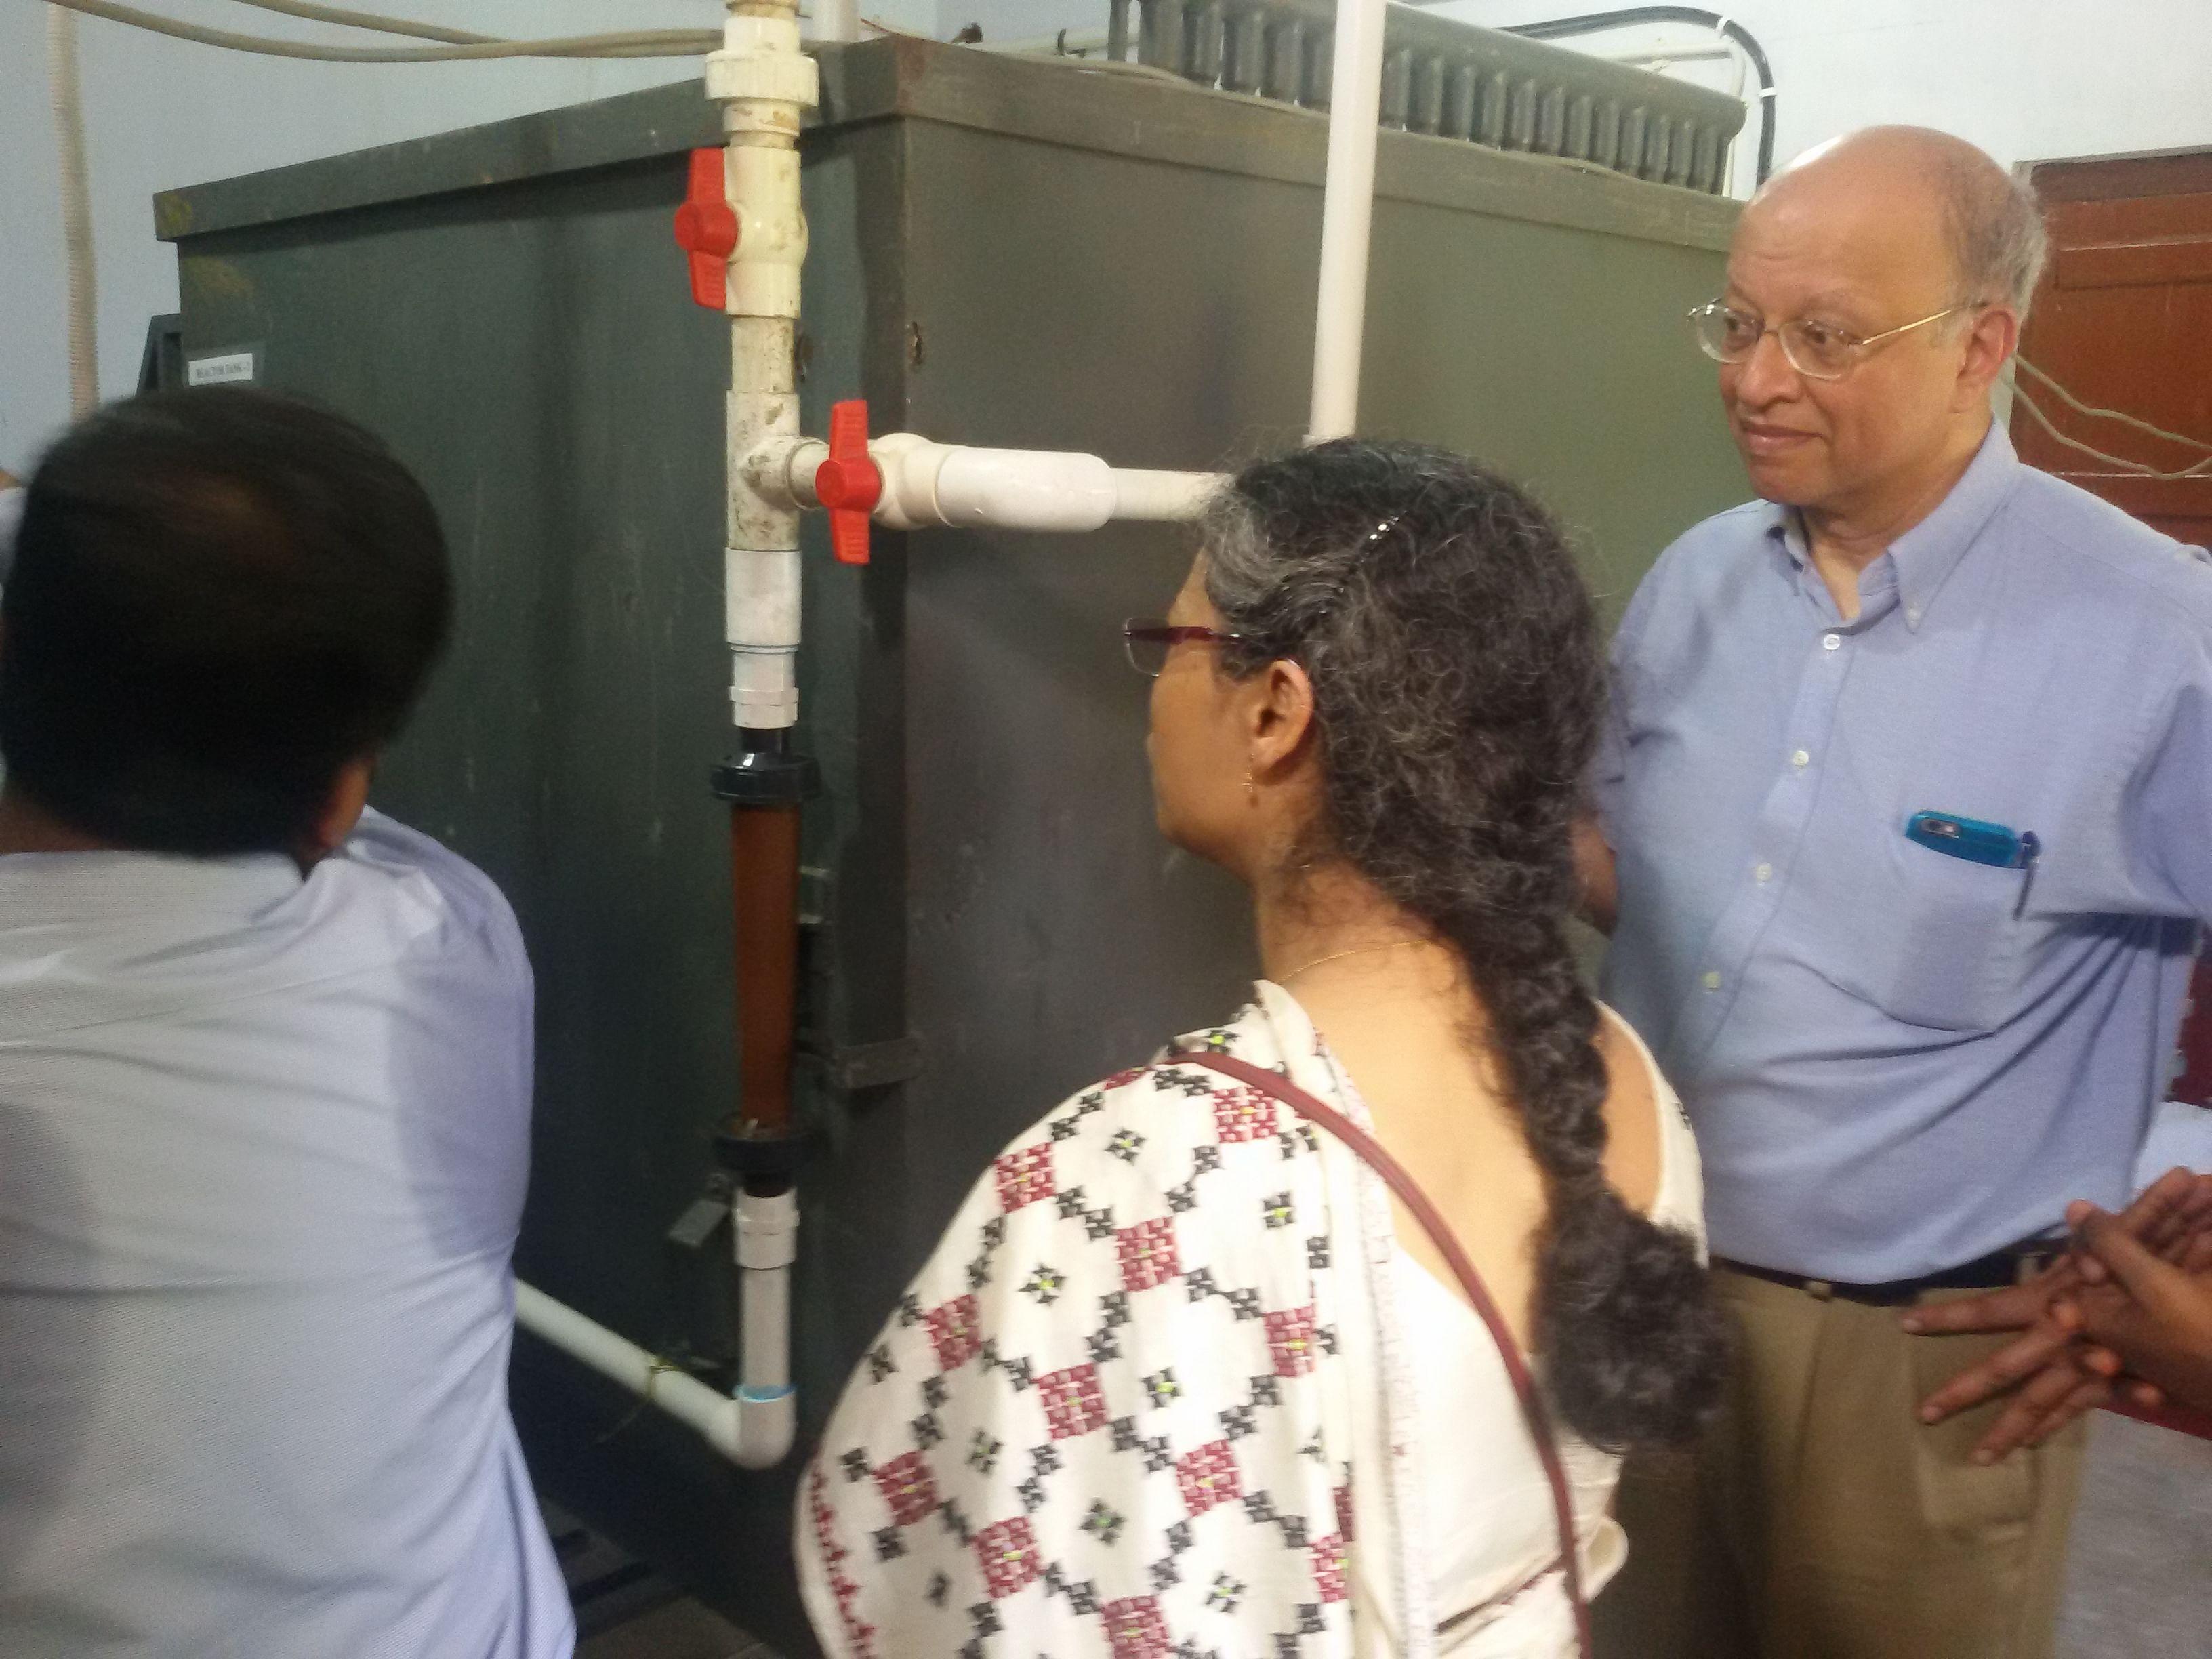 Professor Ashok Gadgil & Professor Joyashree Roy inspecting the reactor tank.